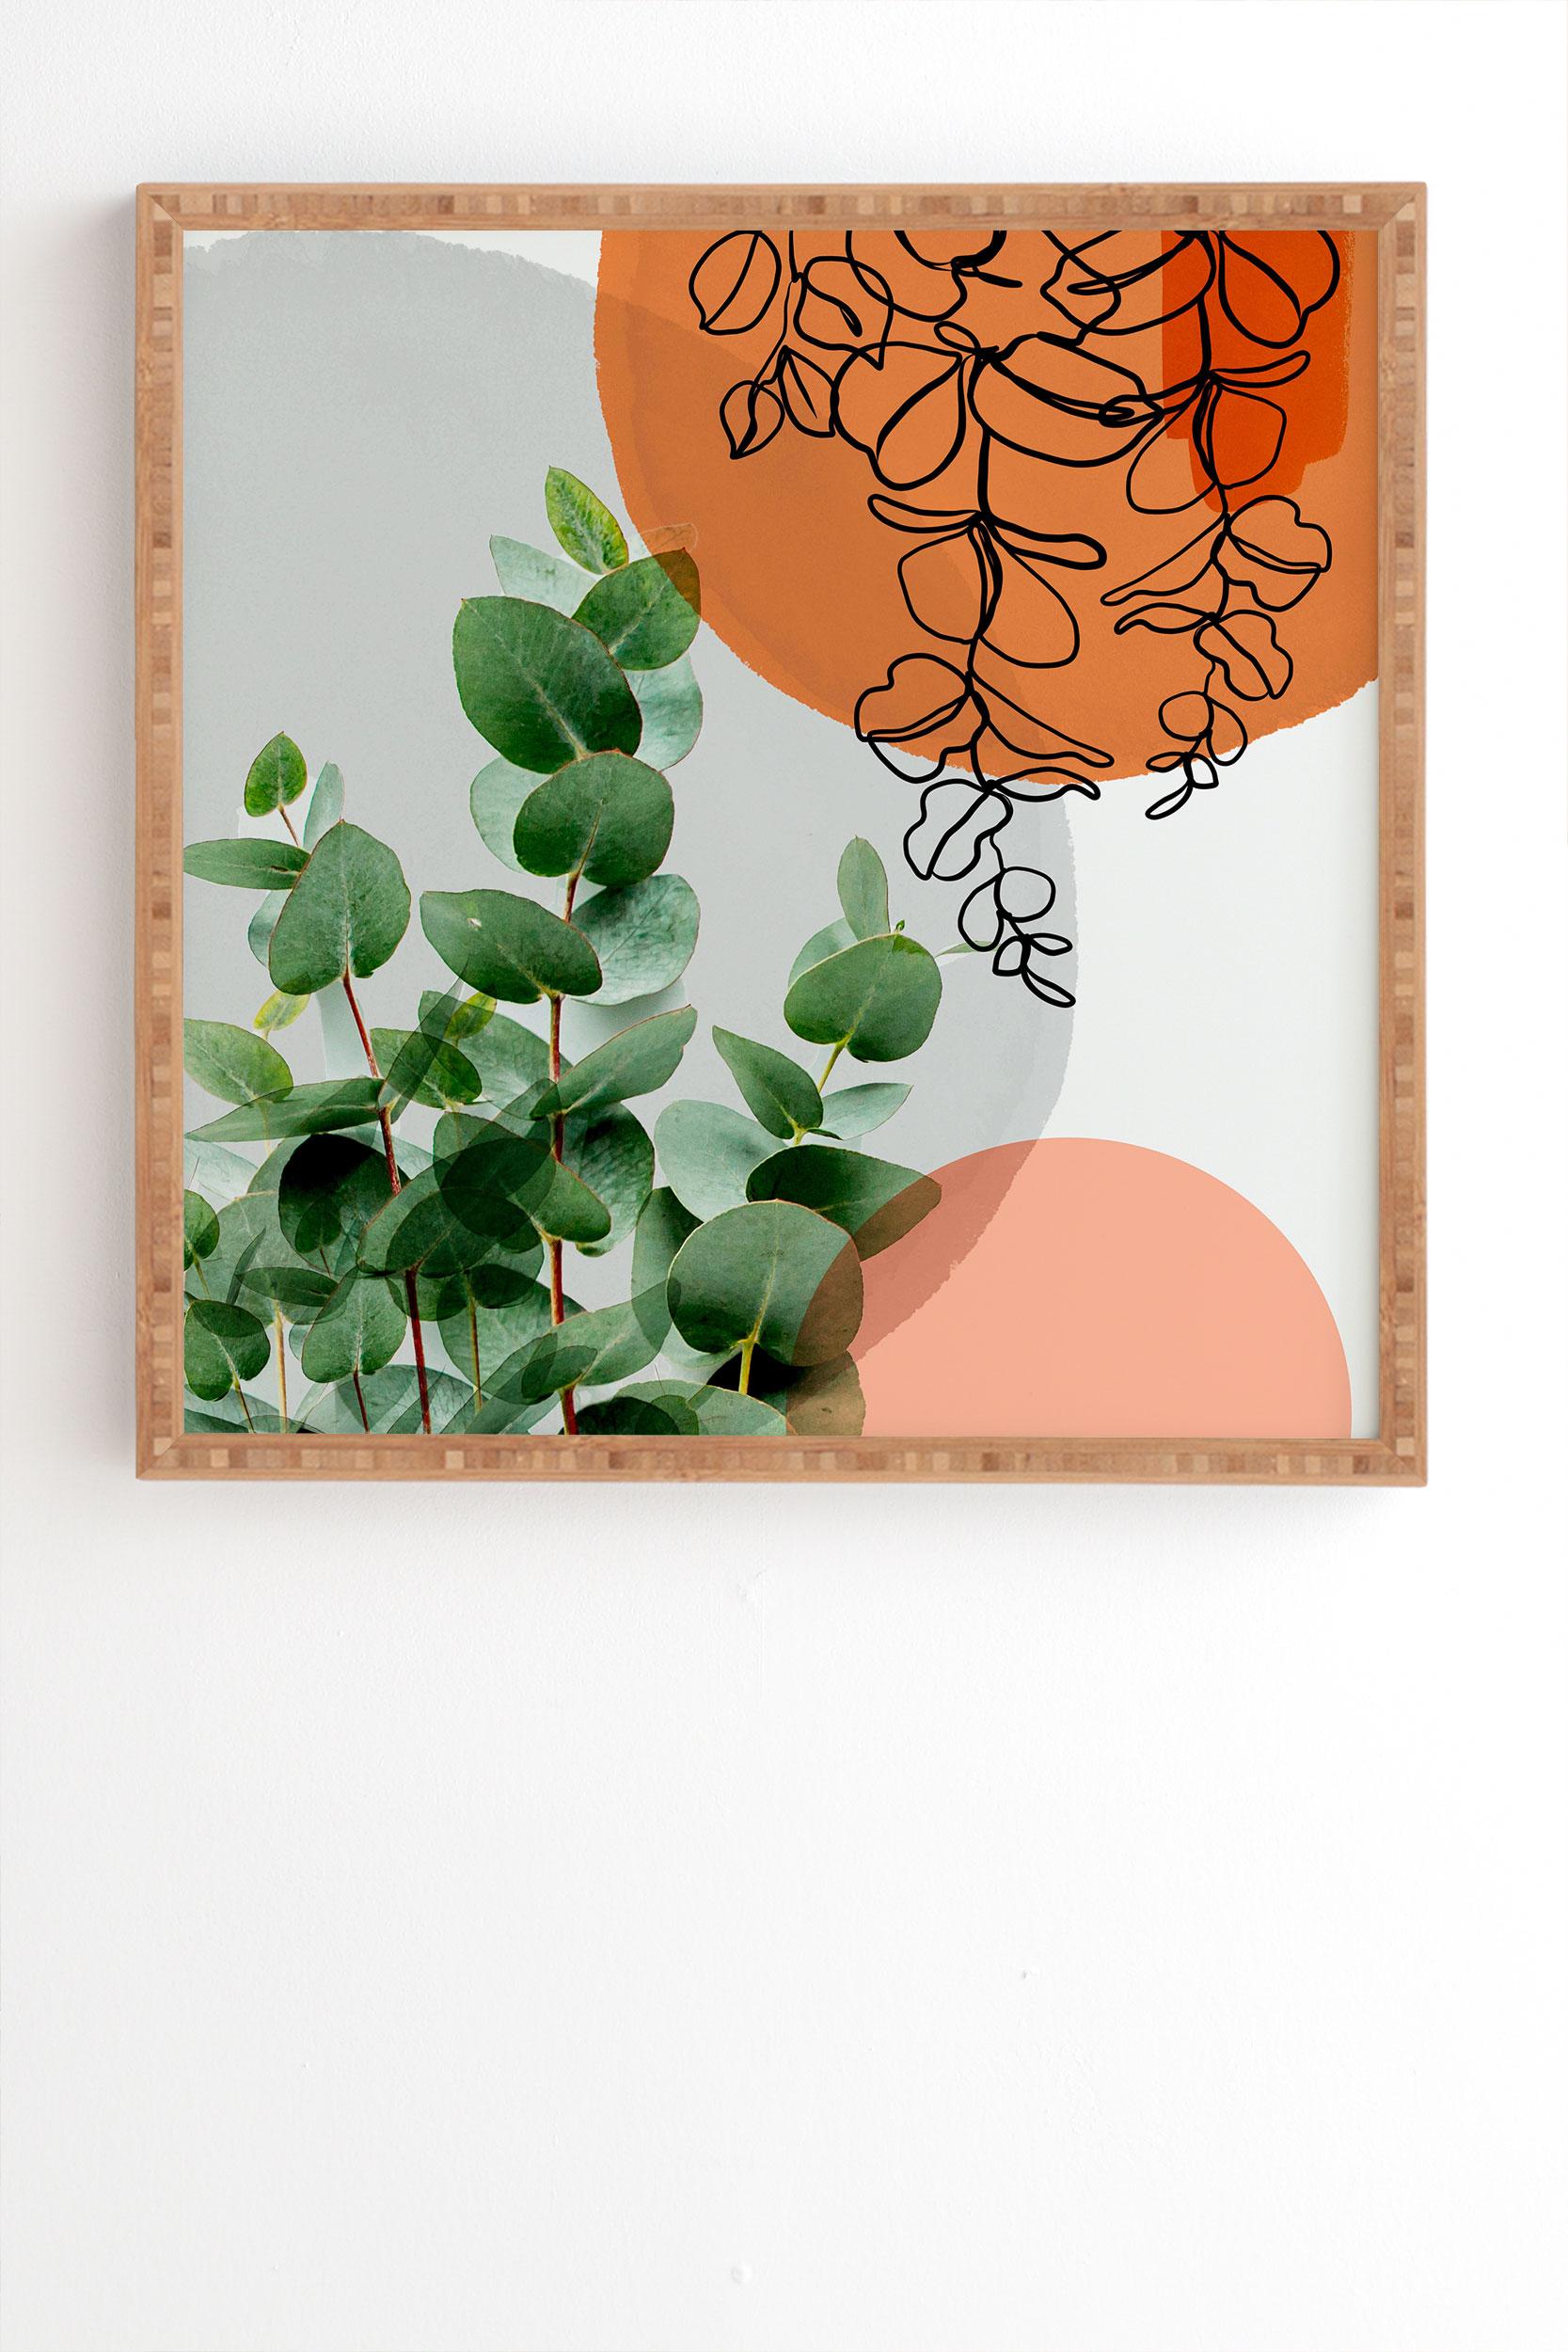 "Simpatico V4 by Gale Switzer - Framed Wall Art Bamboo 8"" x 9.5"""